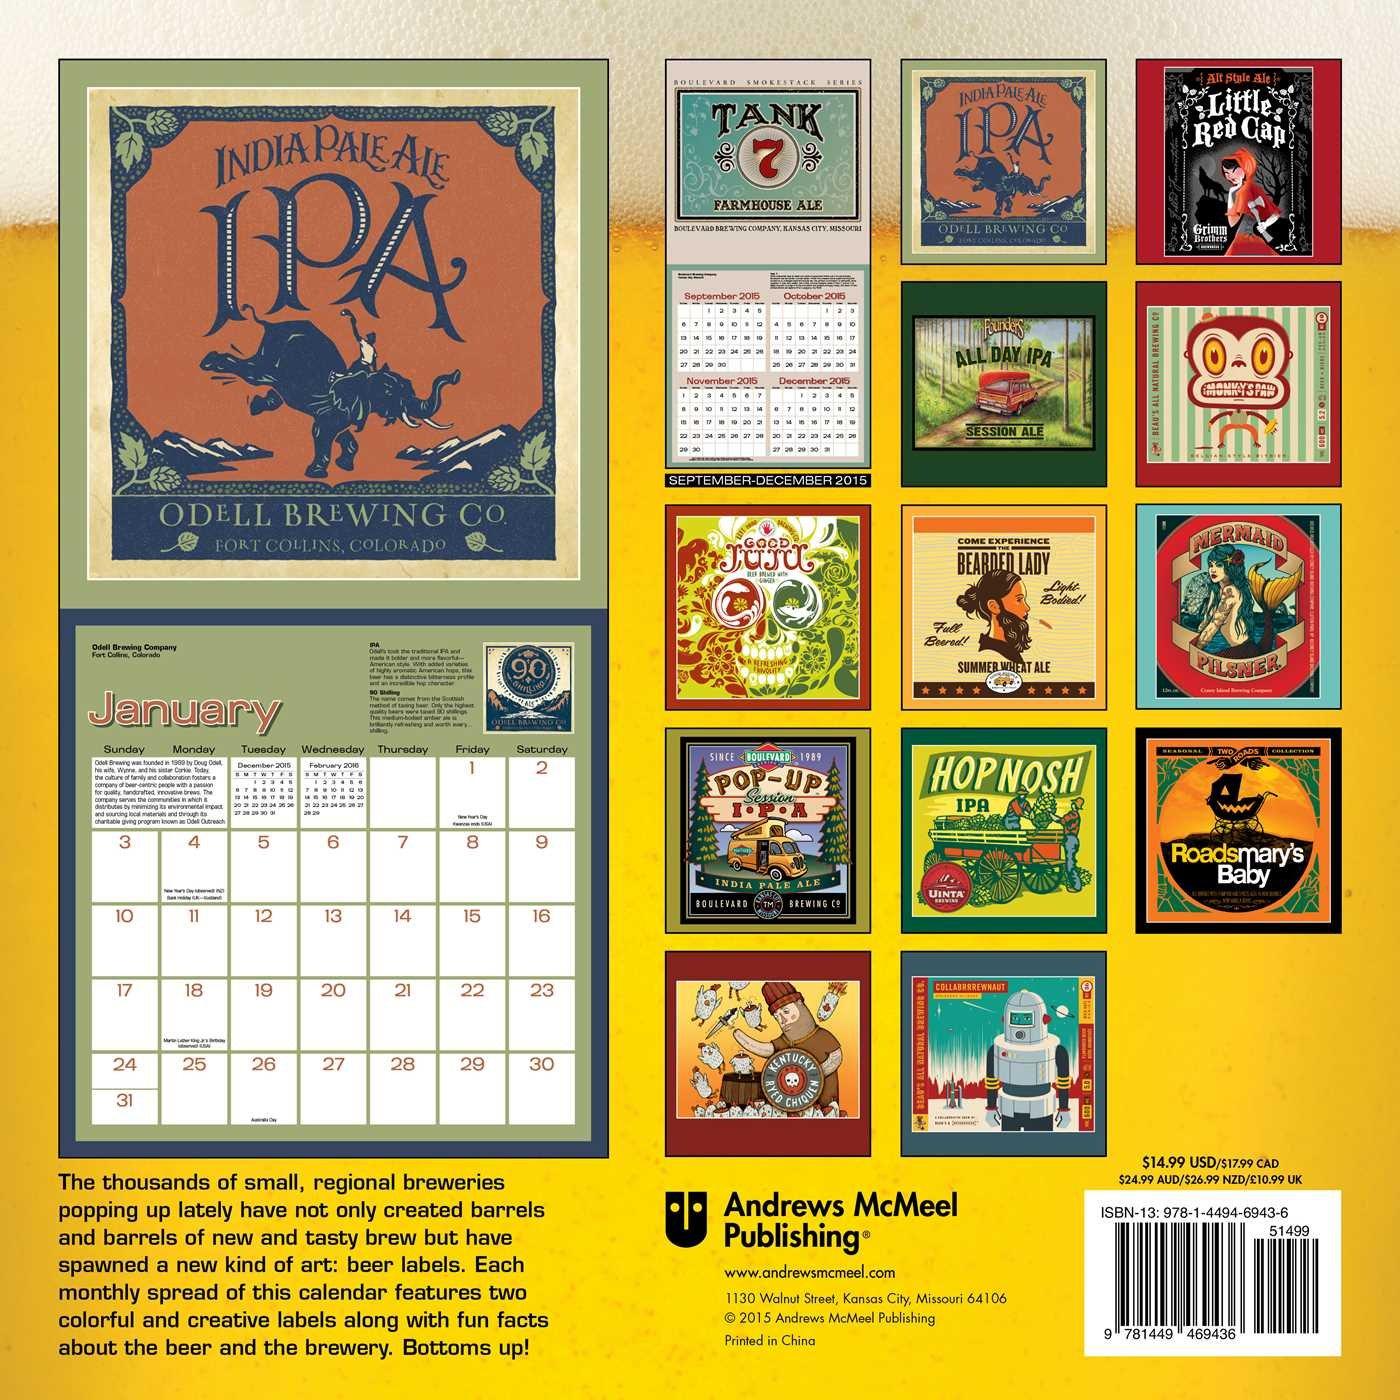 Beer Labels 2016 Wall Calendar: Andrews McMeel Publishing LLC ...